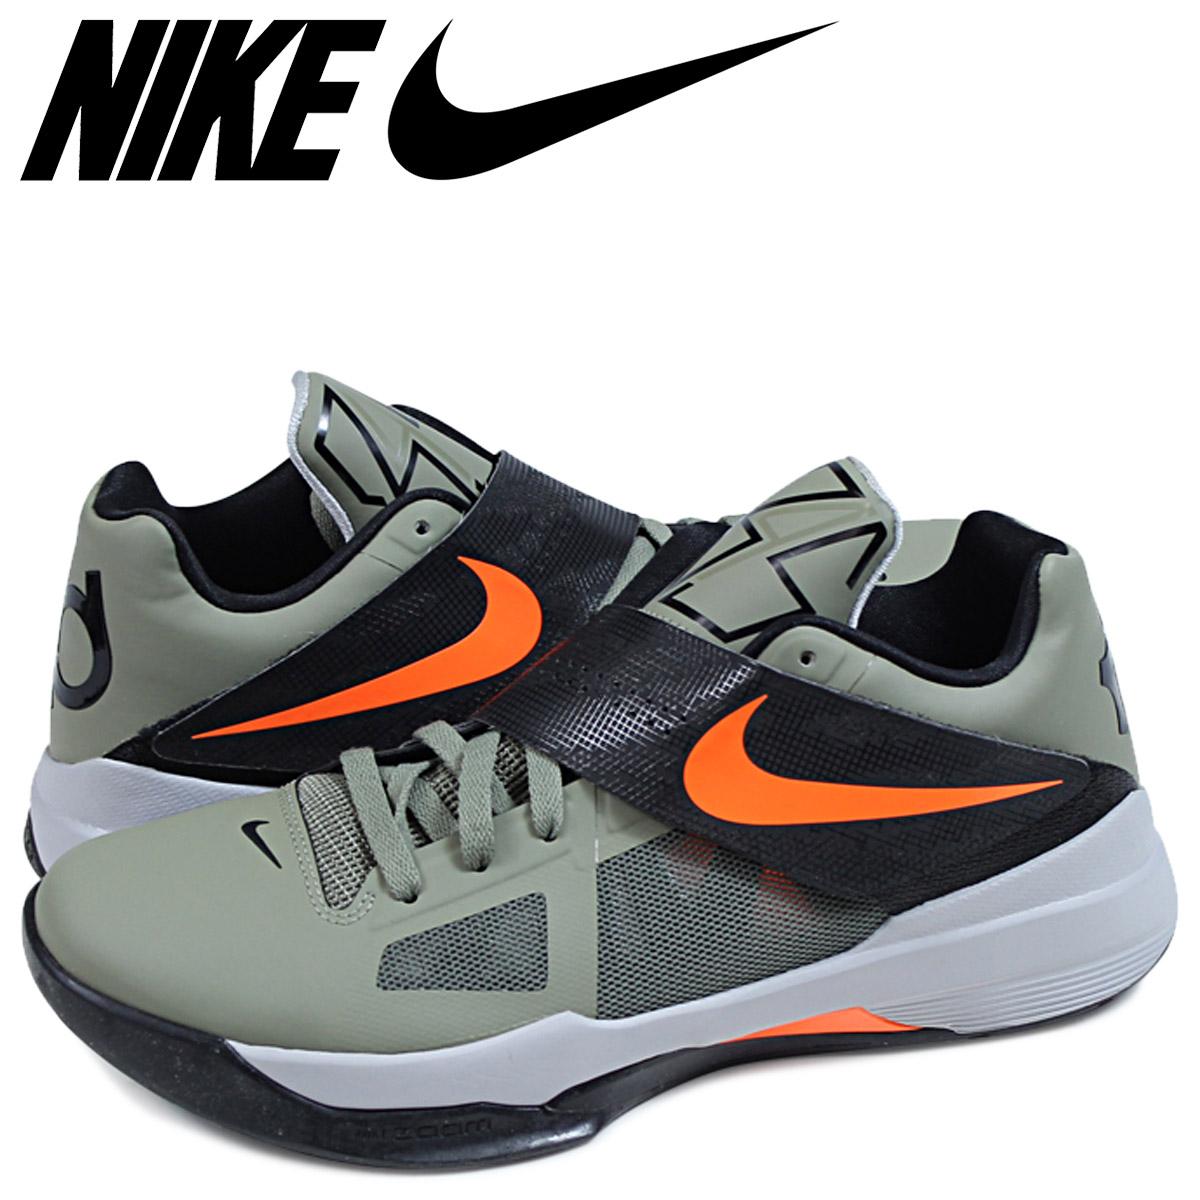 d357280203e8 ALLSPORTS  Nike NIKE zoom sneakers men Kevin Durant 4 ZOOM KD IV ...